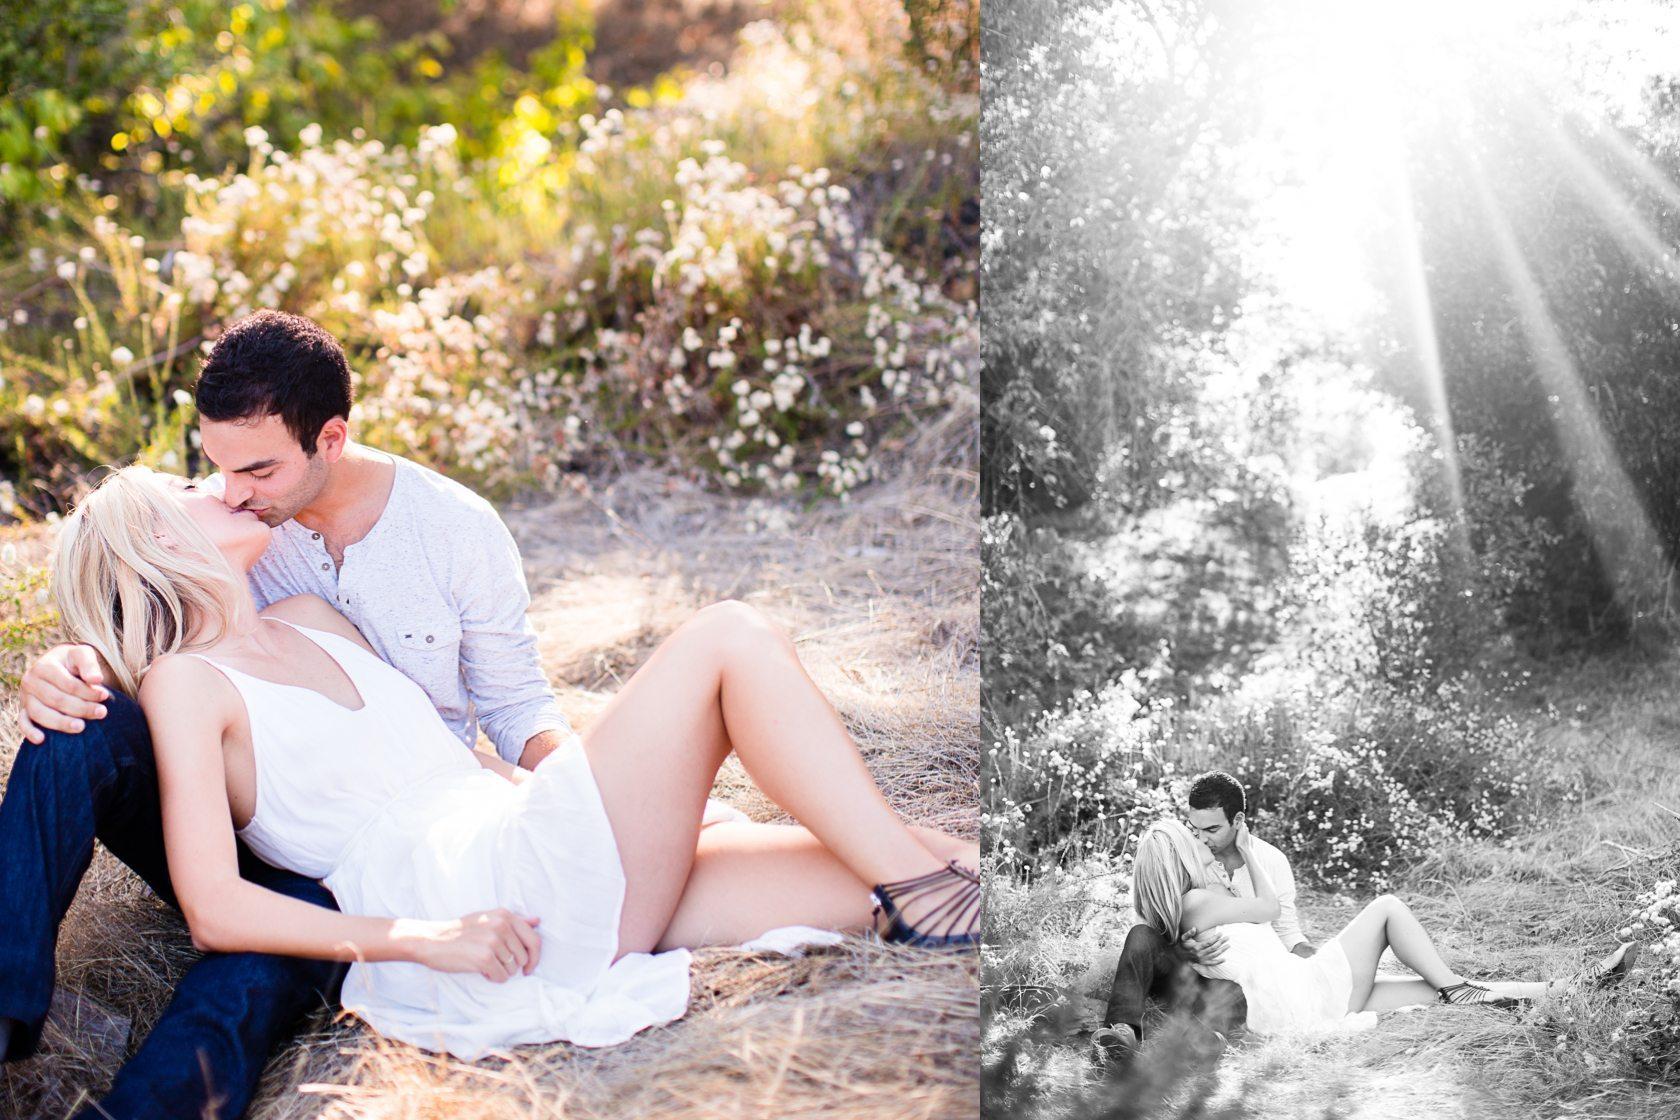 Highland_Springs_Lavender_Field_Engagement_27.jpg